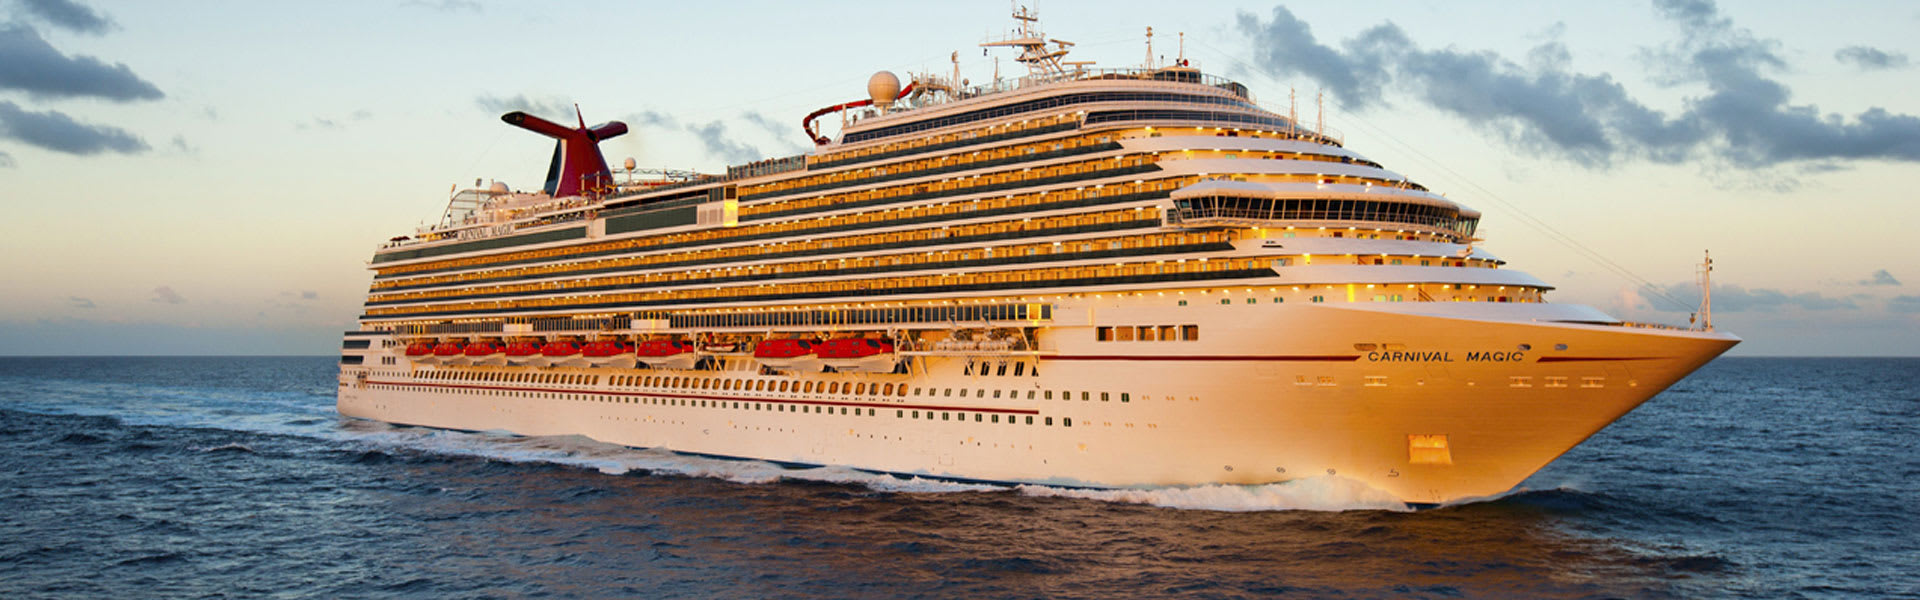 Carnival Magic Cruise Ship Aerial